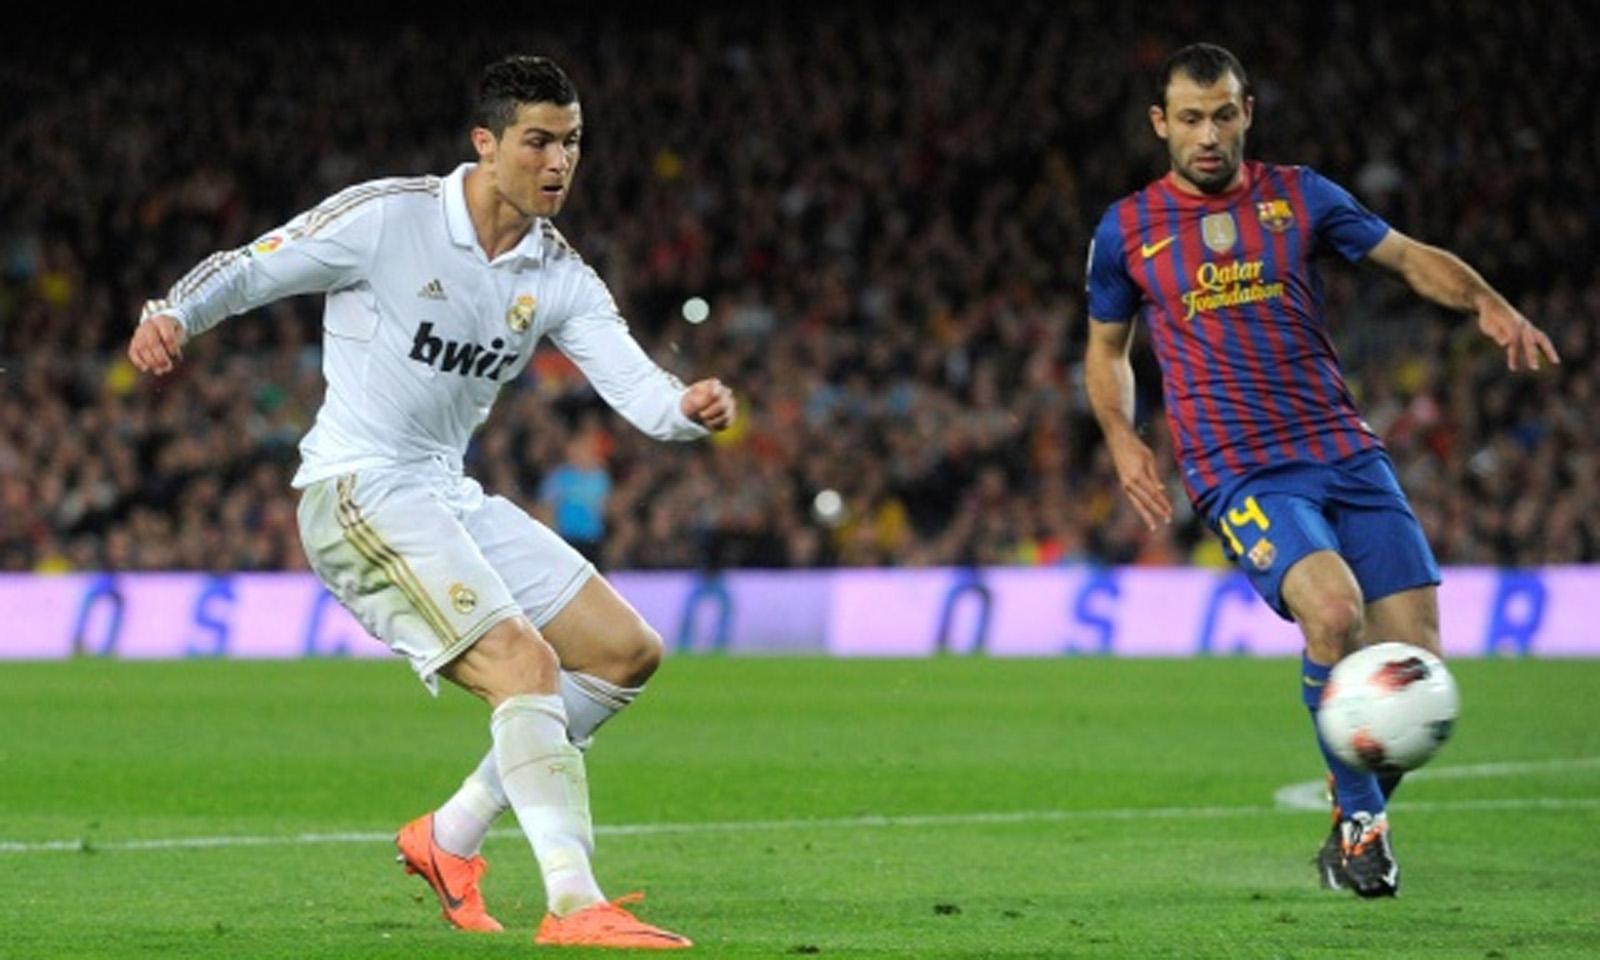 http://1.bp.blogspot.com/-0mPgI5G6vD4/T5MvMJZ-3wI/AAAAAAAAAP8/Id0aAucD0qo/s1600/Ronaldo.jpg